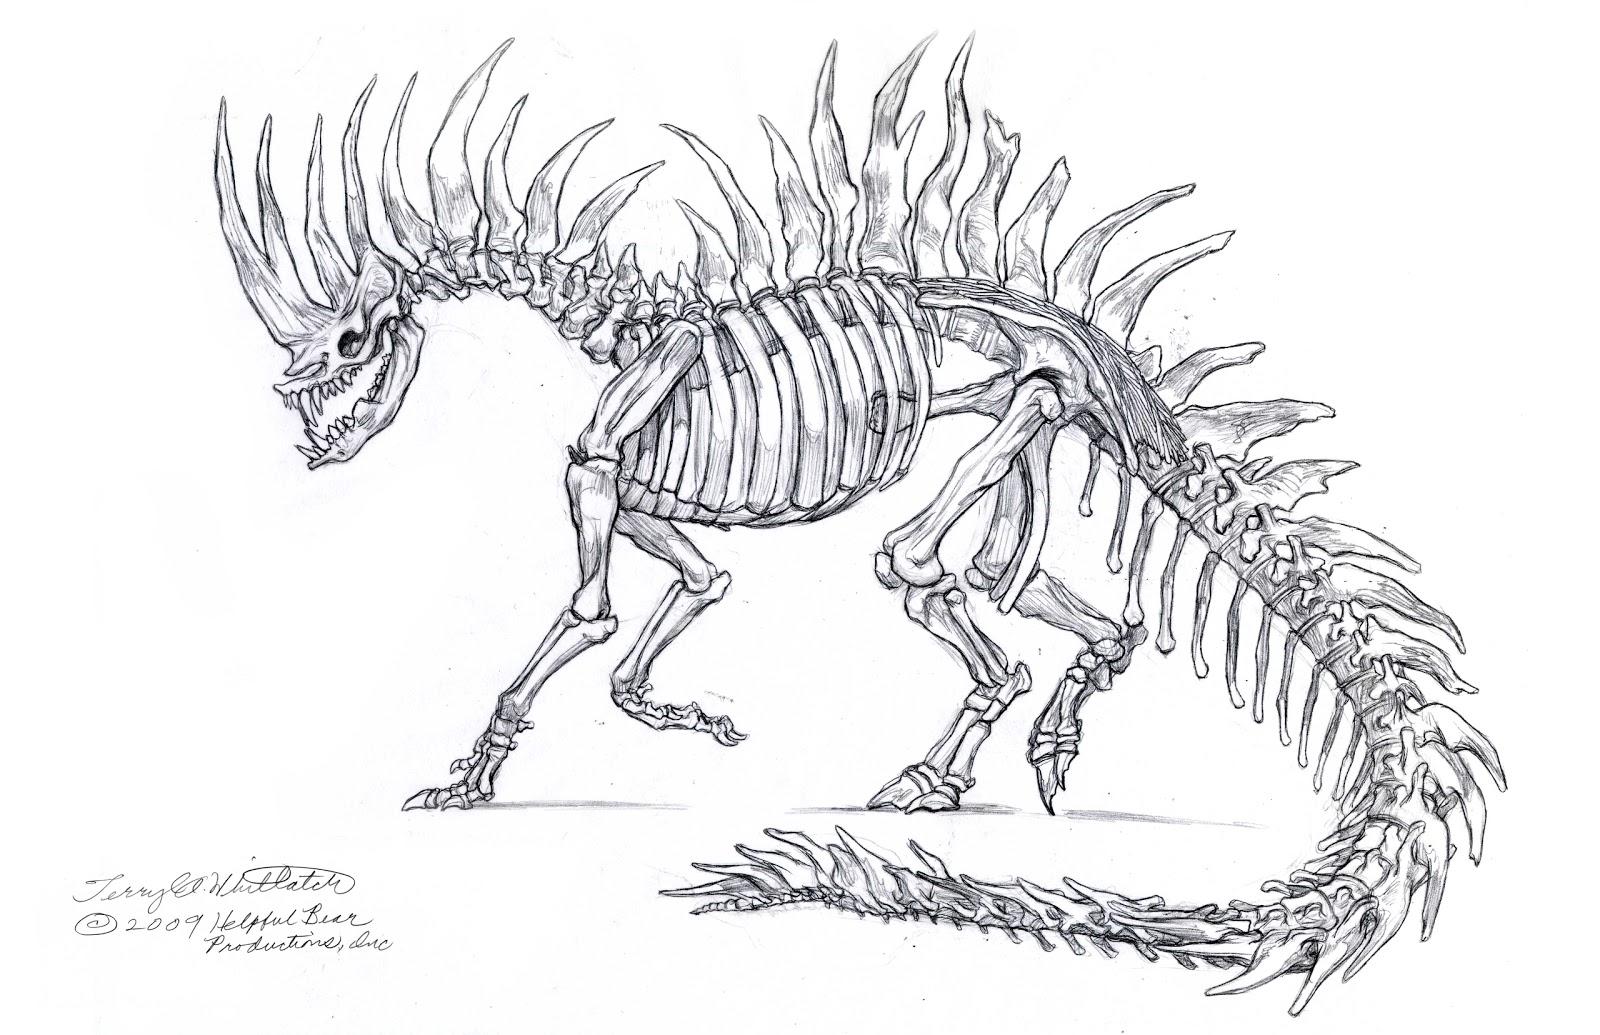 Gallery For gt Dragon Anatomy Skeleton